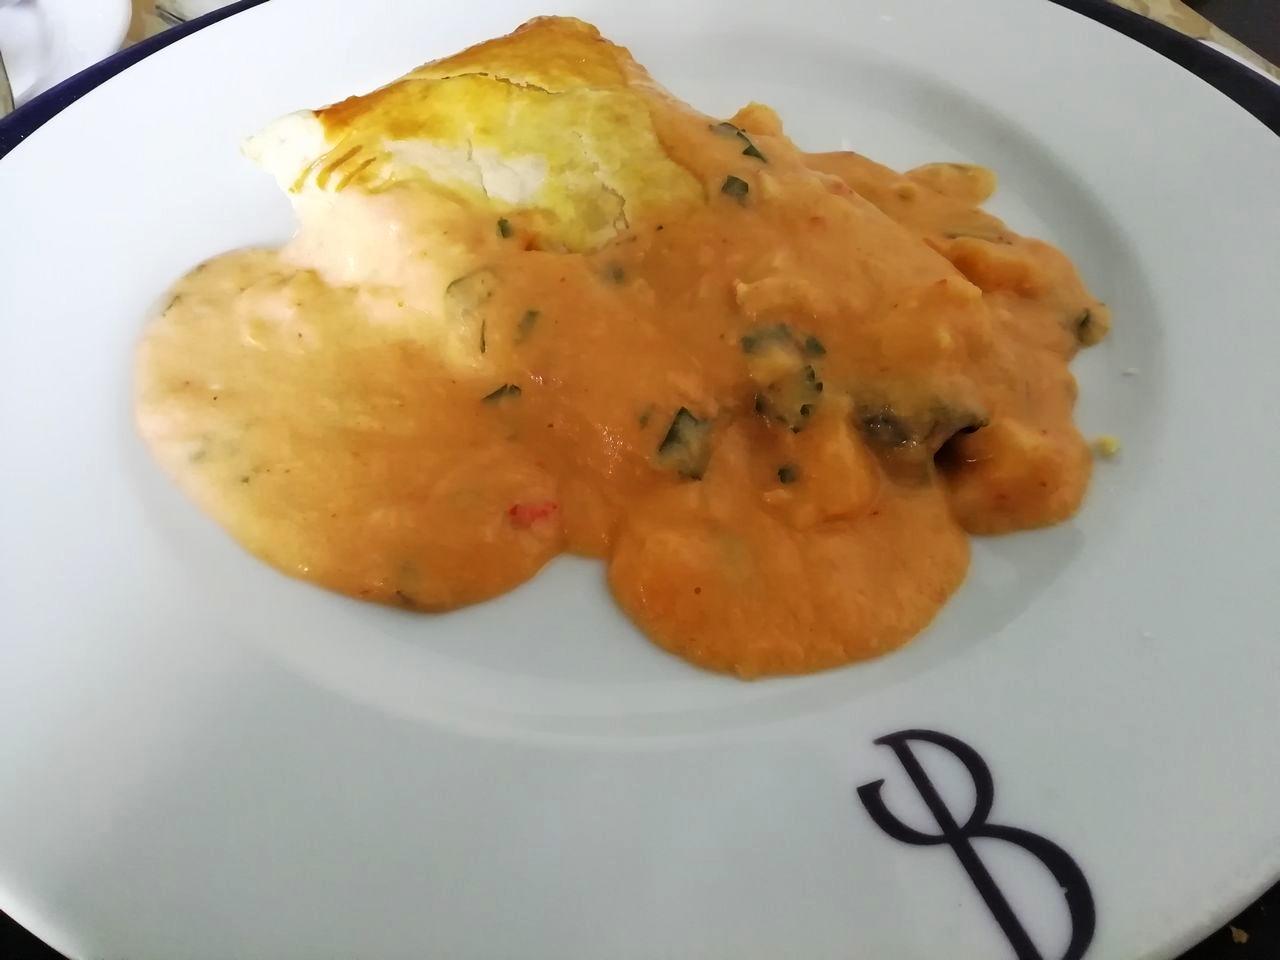 En Quinta da Boeira, en la zona de Vila Nova de Gaia, tomamos este pastel de verduras.